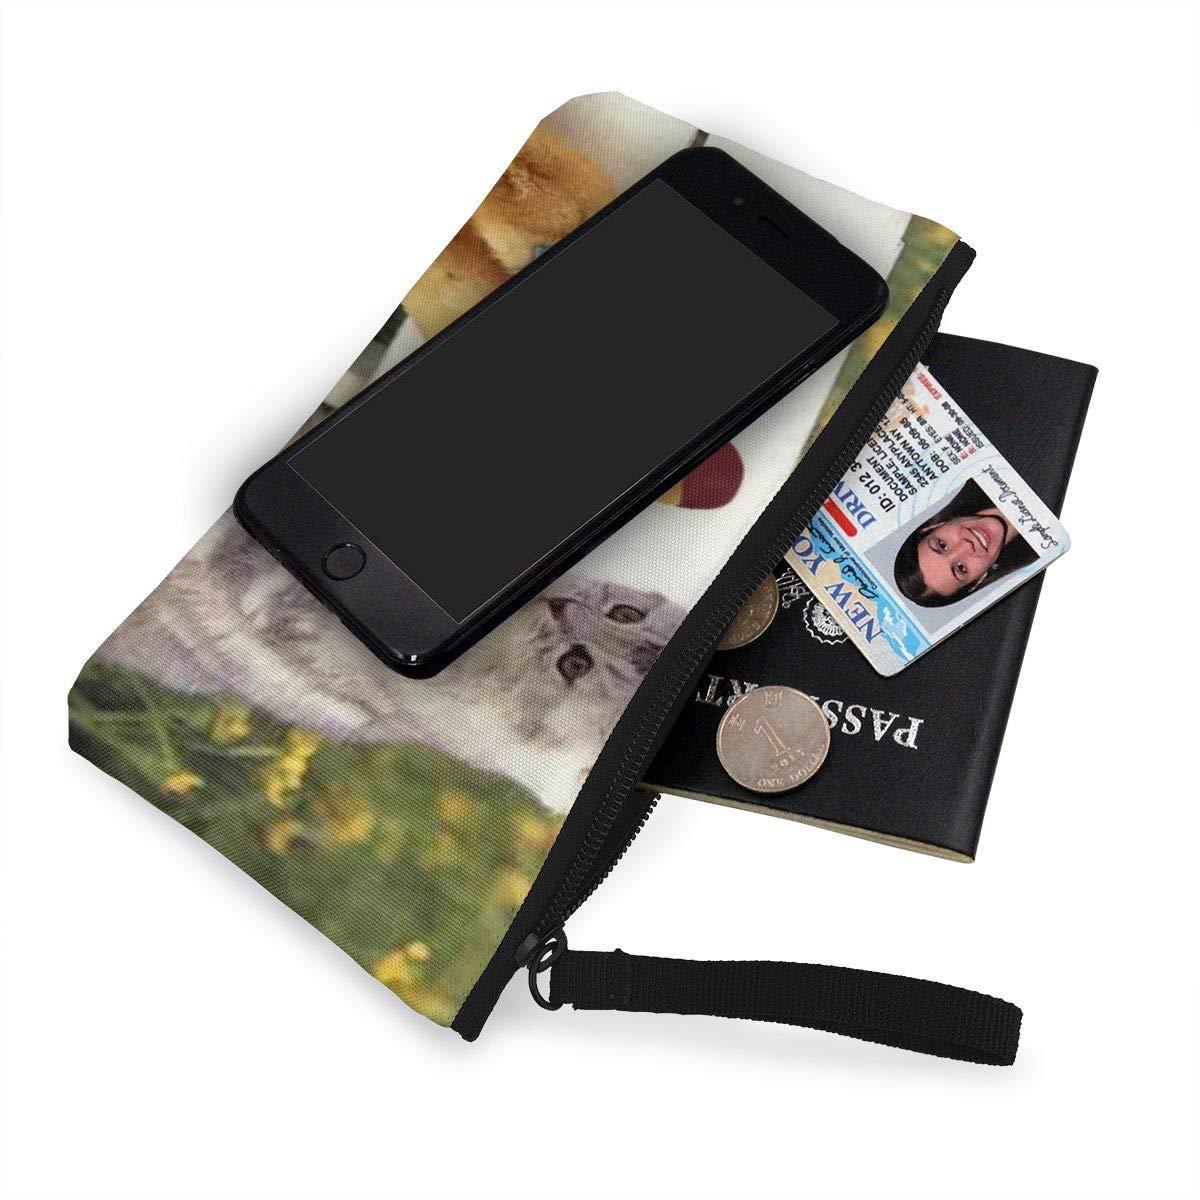 Coin Purse Funny Ducklings Cute Cat Womens Zipper Canvas Purse Wallet TravelMarvellous Holder